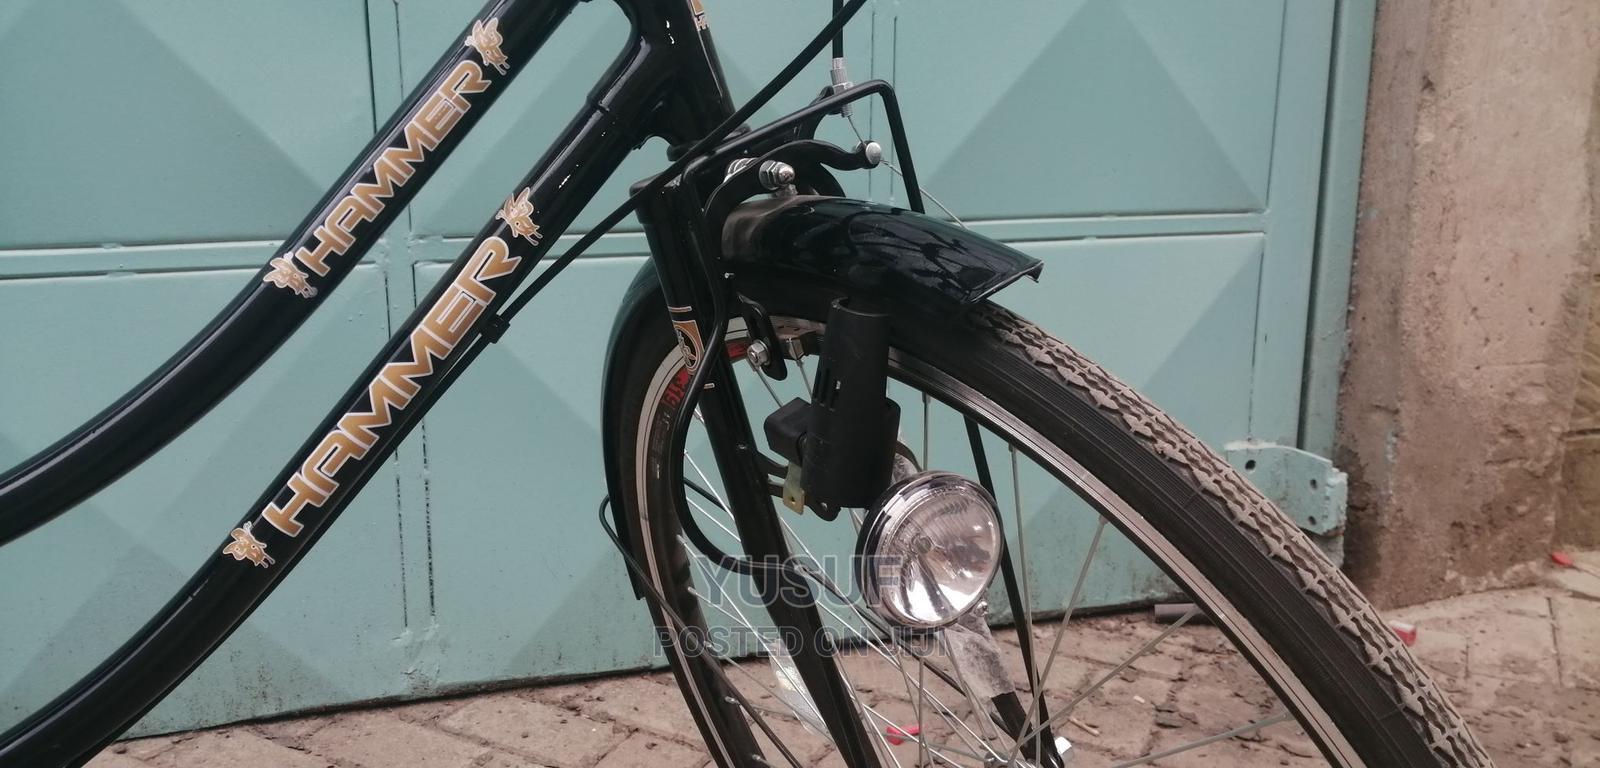 Adult City Bicycle, Black Mamba Type | Sports Equipment for sale in Industrial Area Nairobi, Nairobi, Kenya